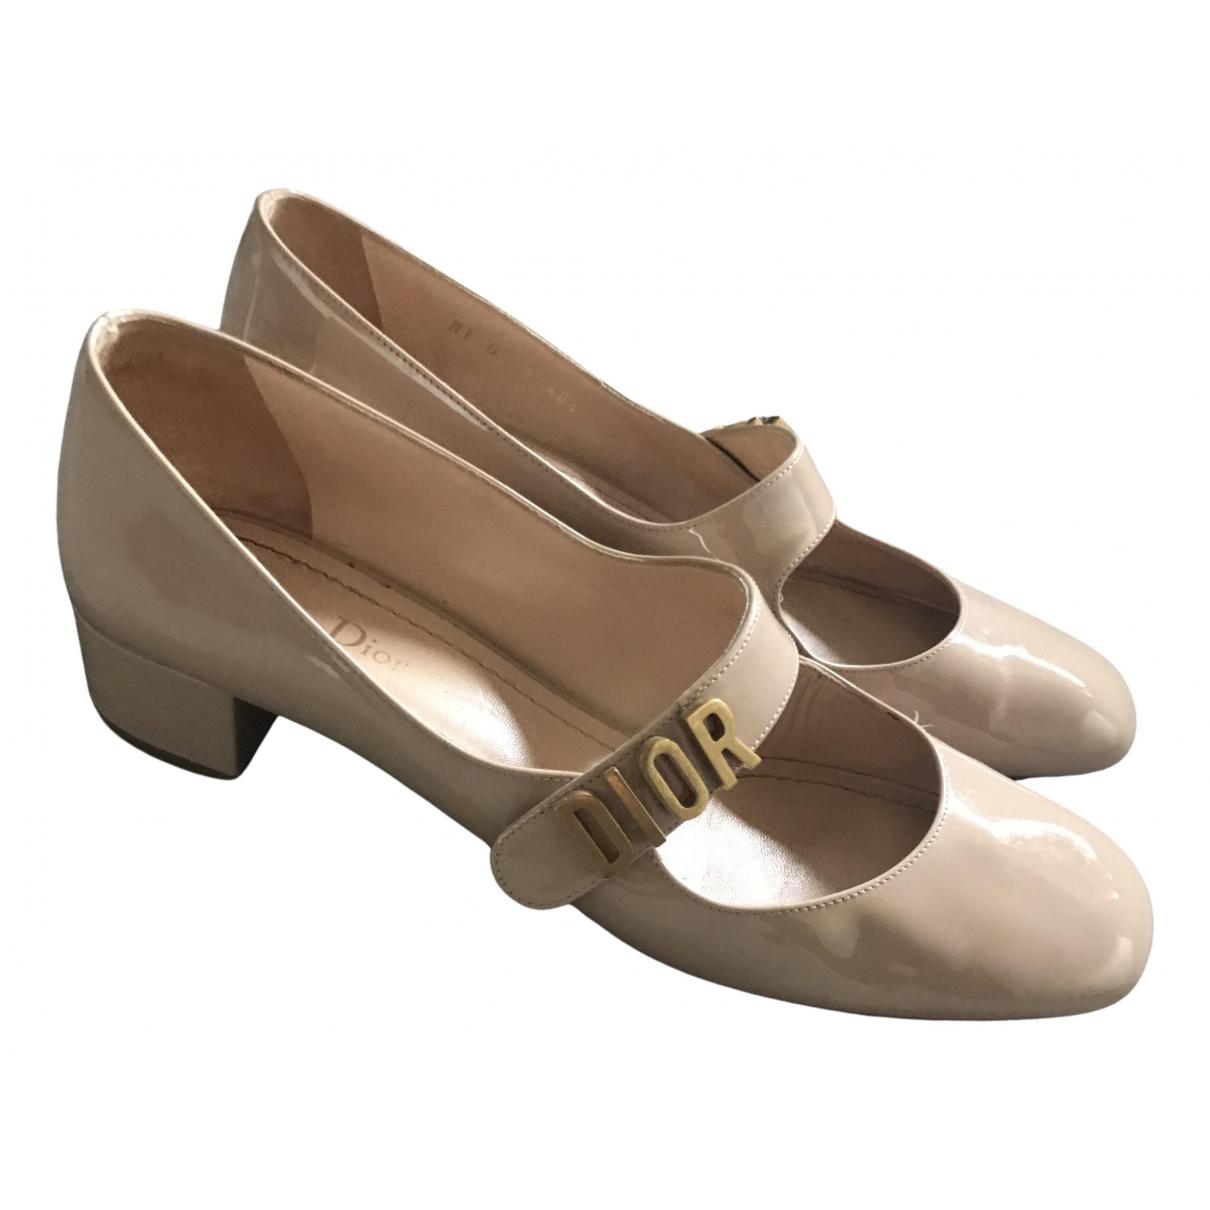 Dior - Ballerines Baby-D pour femme en cuir verni - beige